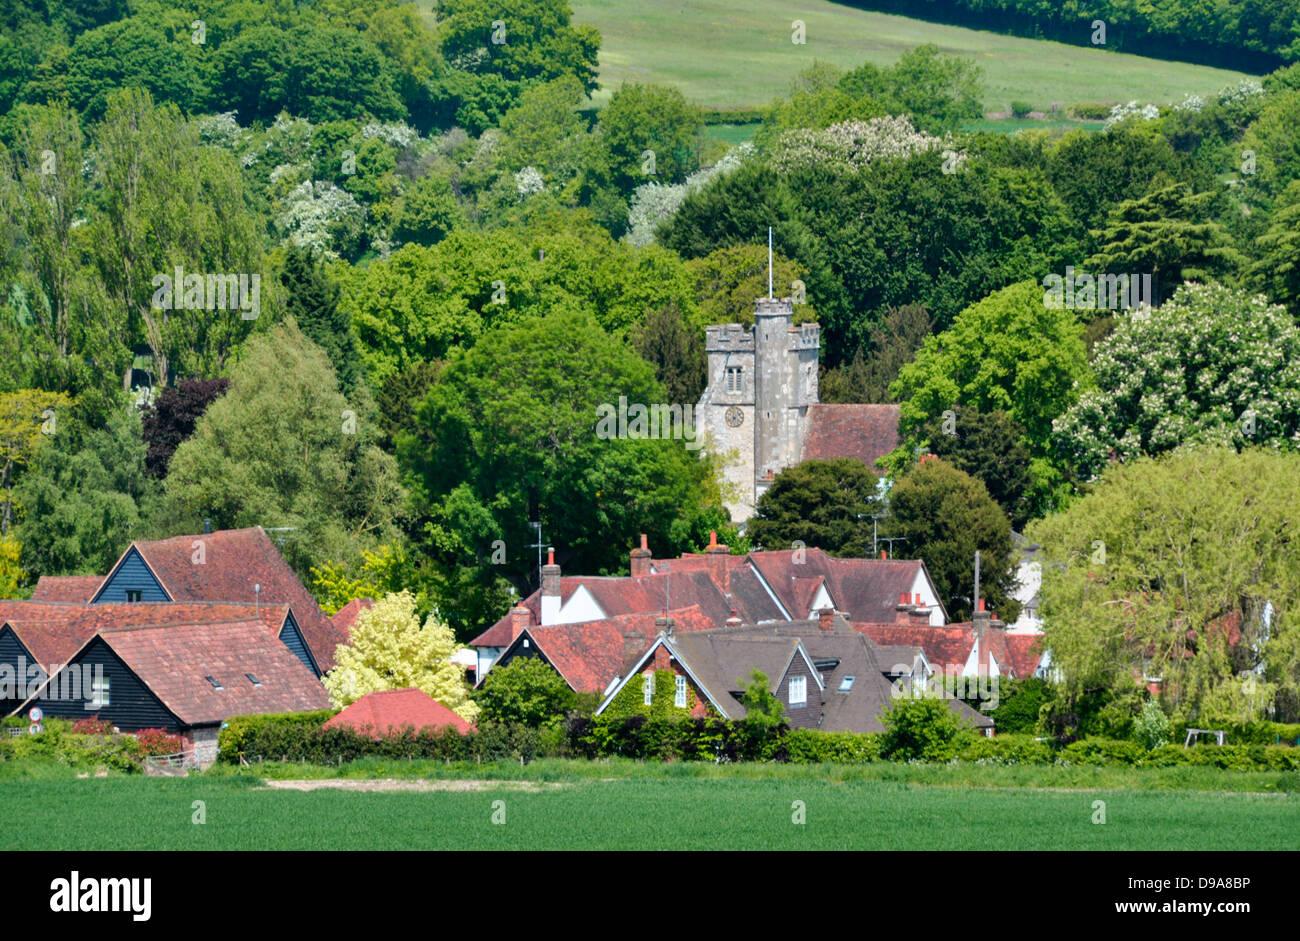 Bucks - Chiltern Hills - landscape - Little Missenden village - church tower - cottages - russet rooftops - wooded - Stock Image